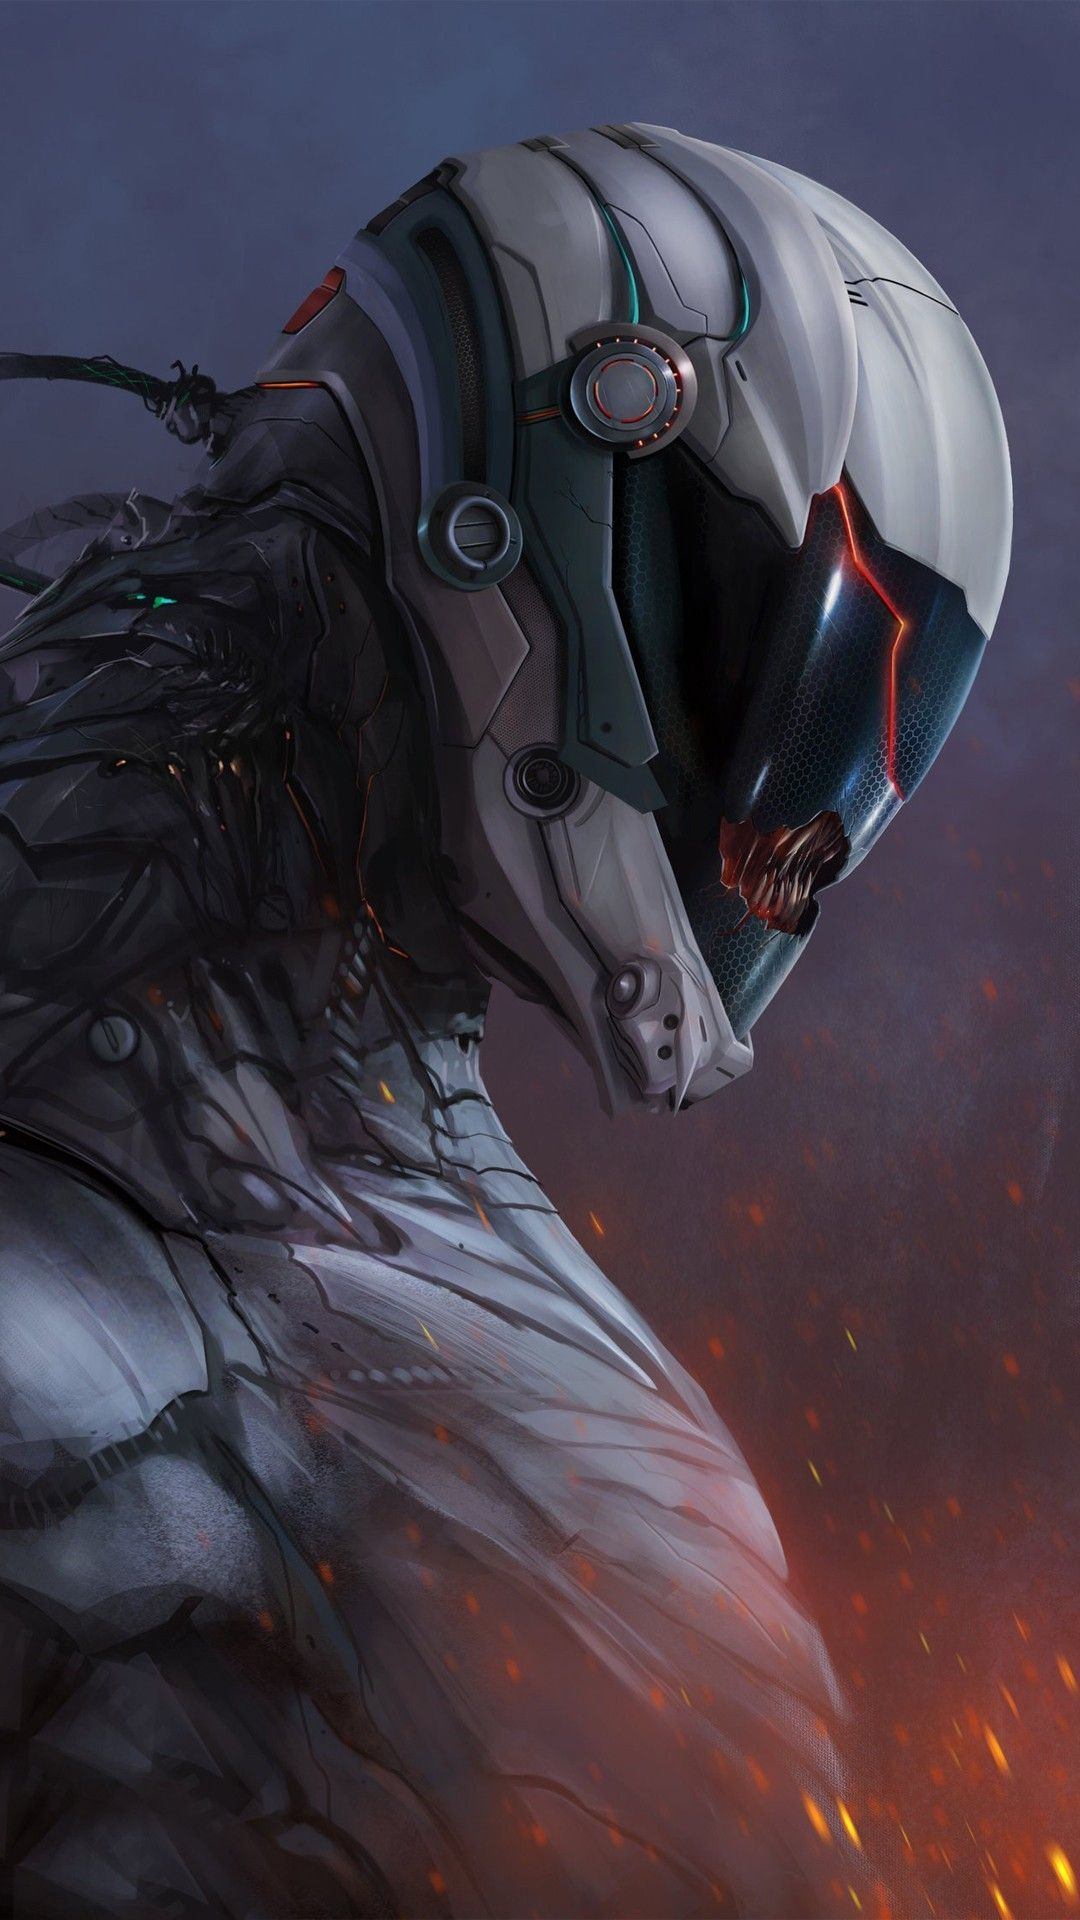 Cyborg Samurai Wallpapers - Top Free Cyborg Samurai ...